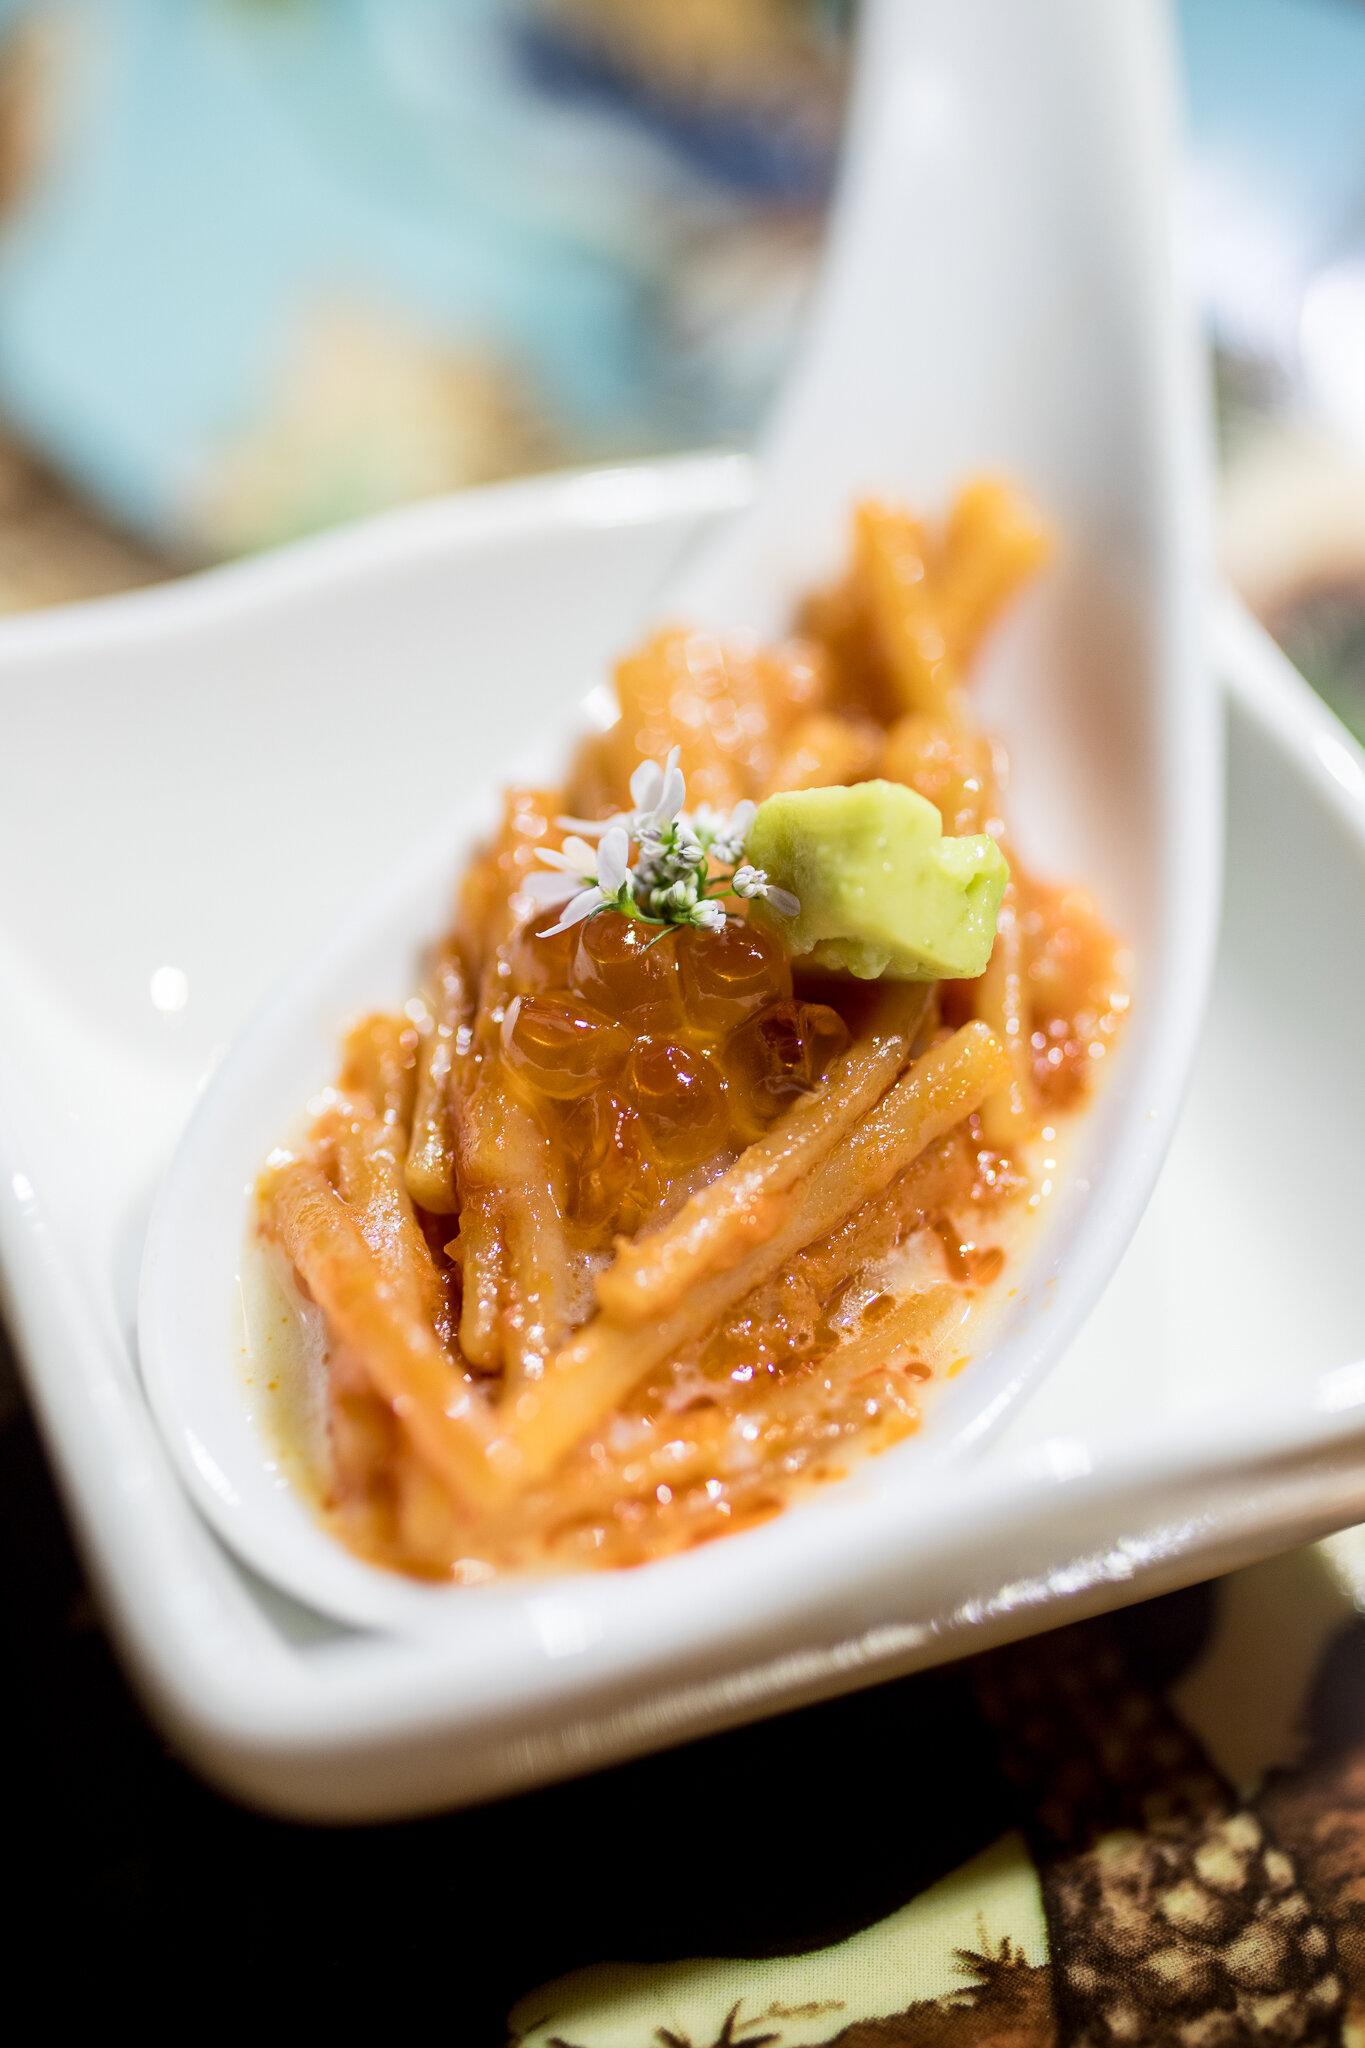 Fideo Seco, Avocado, Crème Fraîche, Salmon Roe